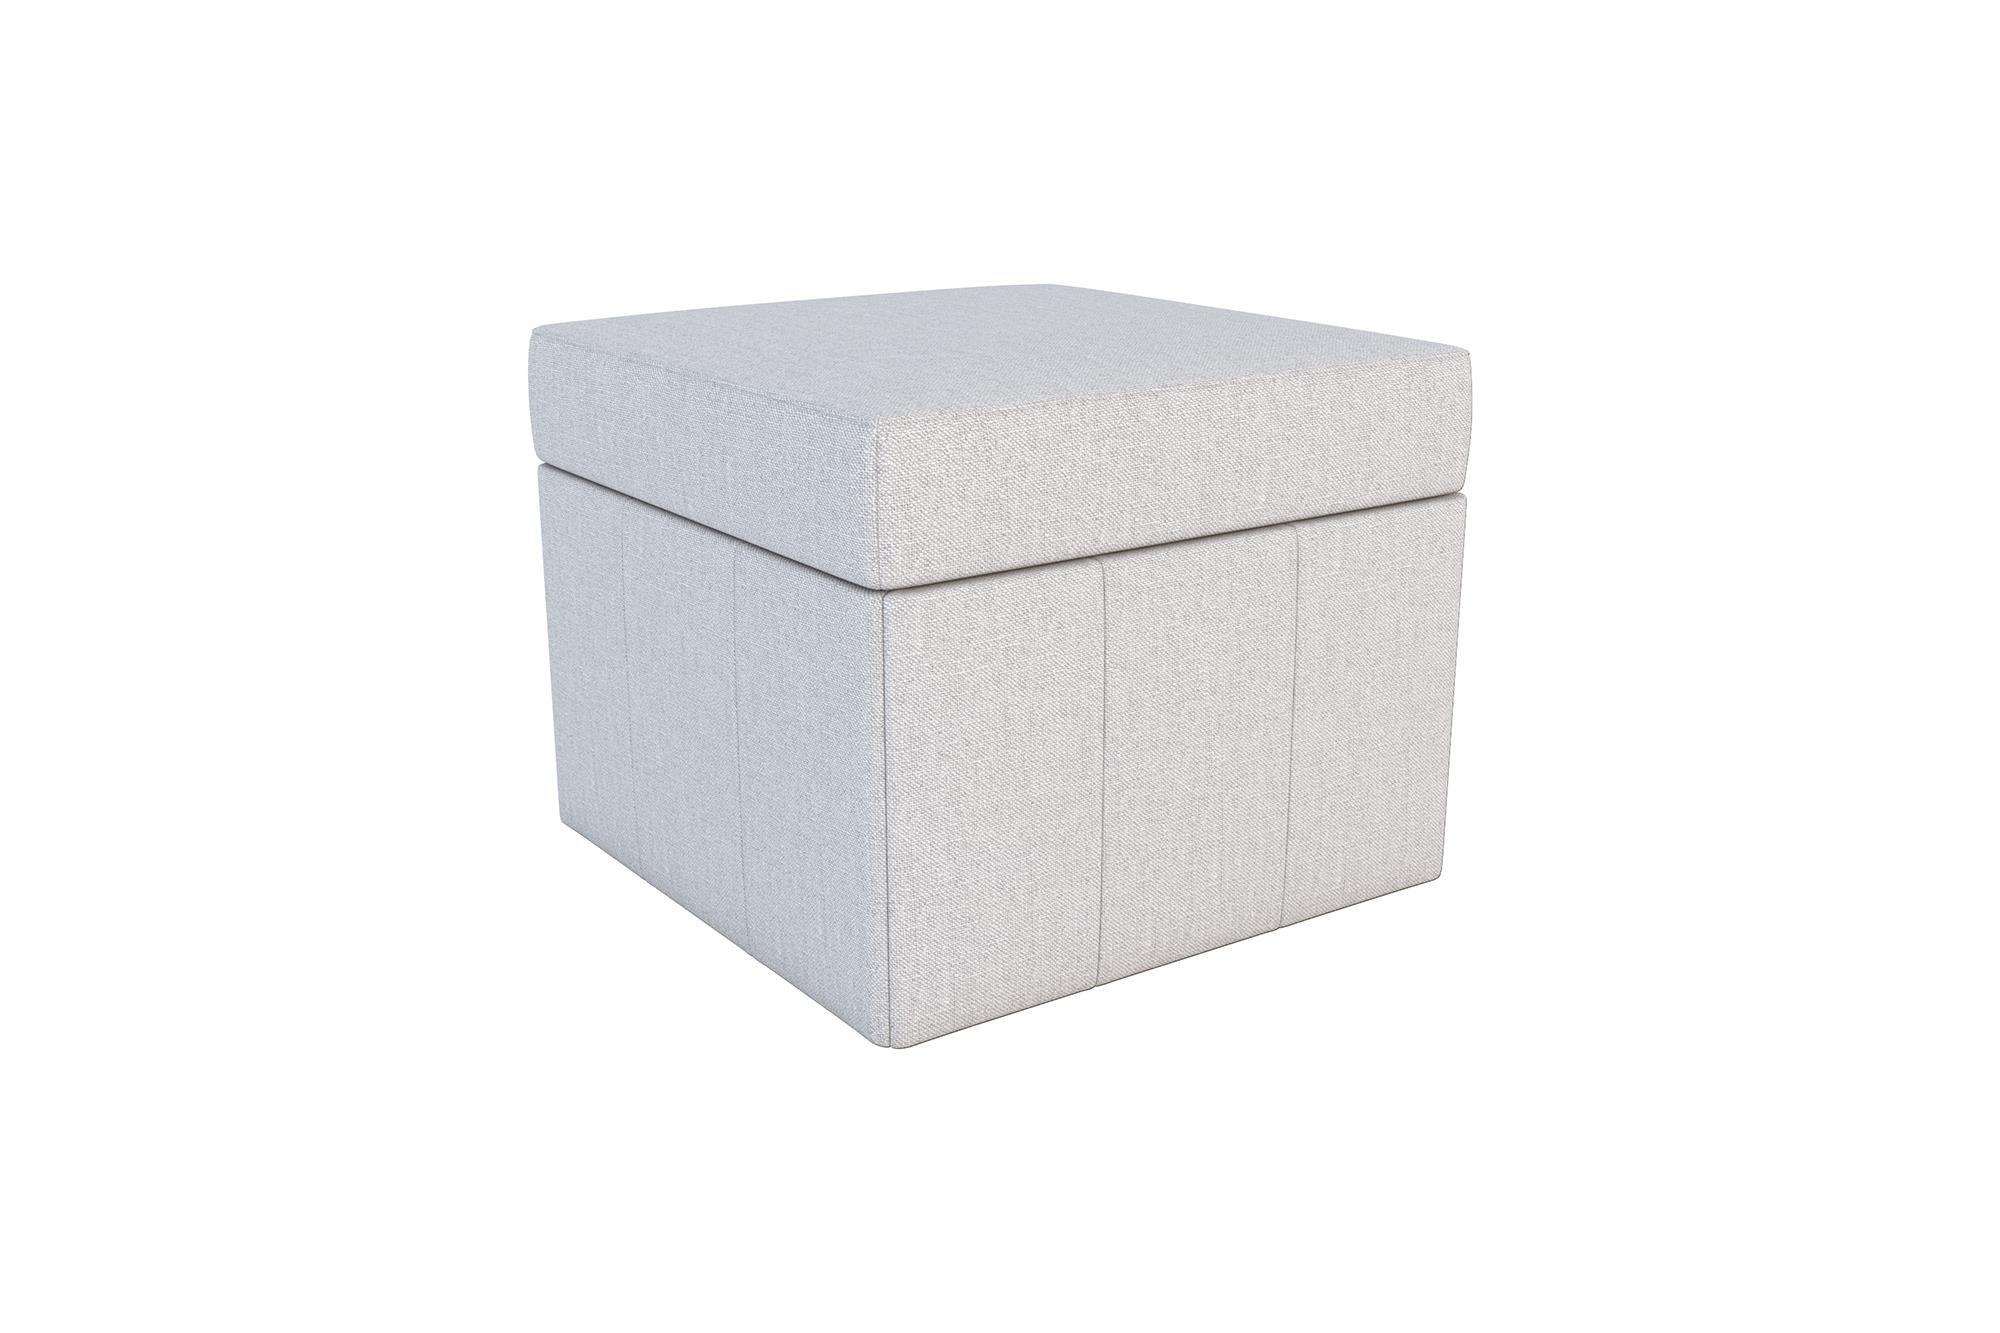 Novogratz Brittany Square Storage Ottoman, Premium Linen Upholstery, Lightweight, Grey Linen by Novogratz